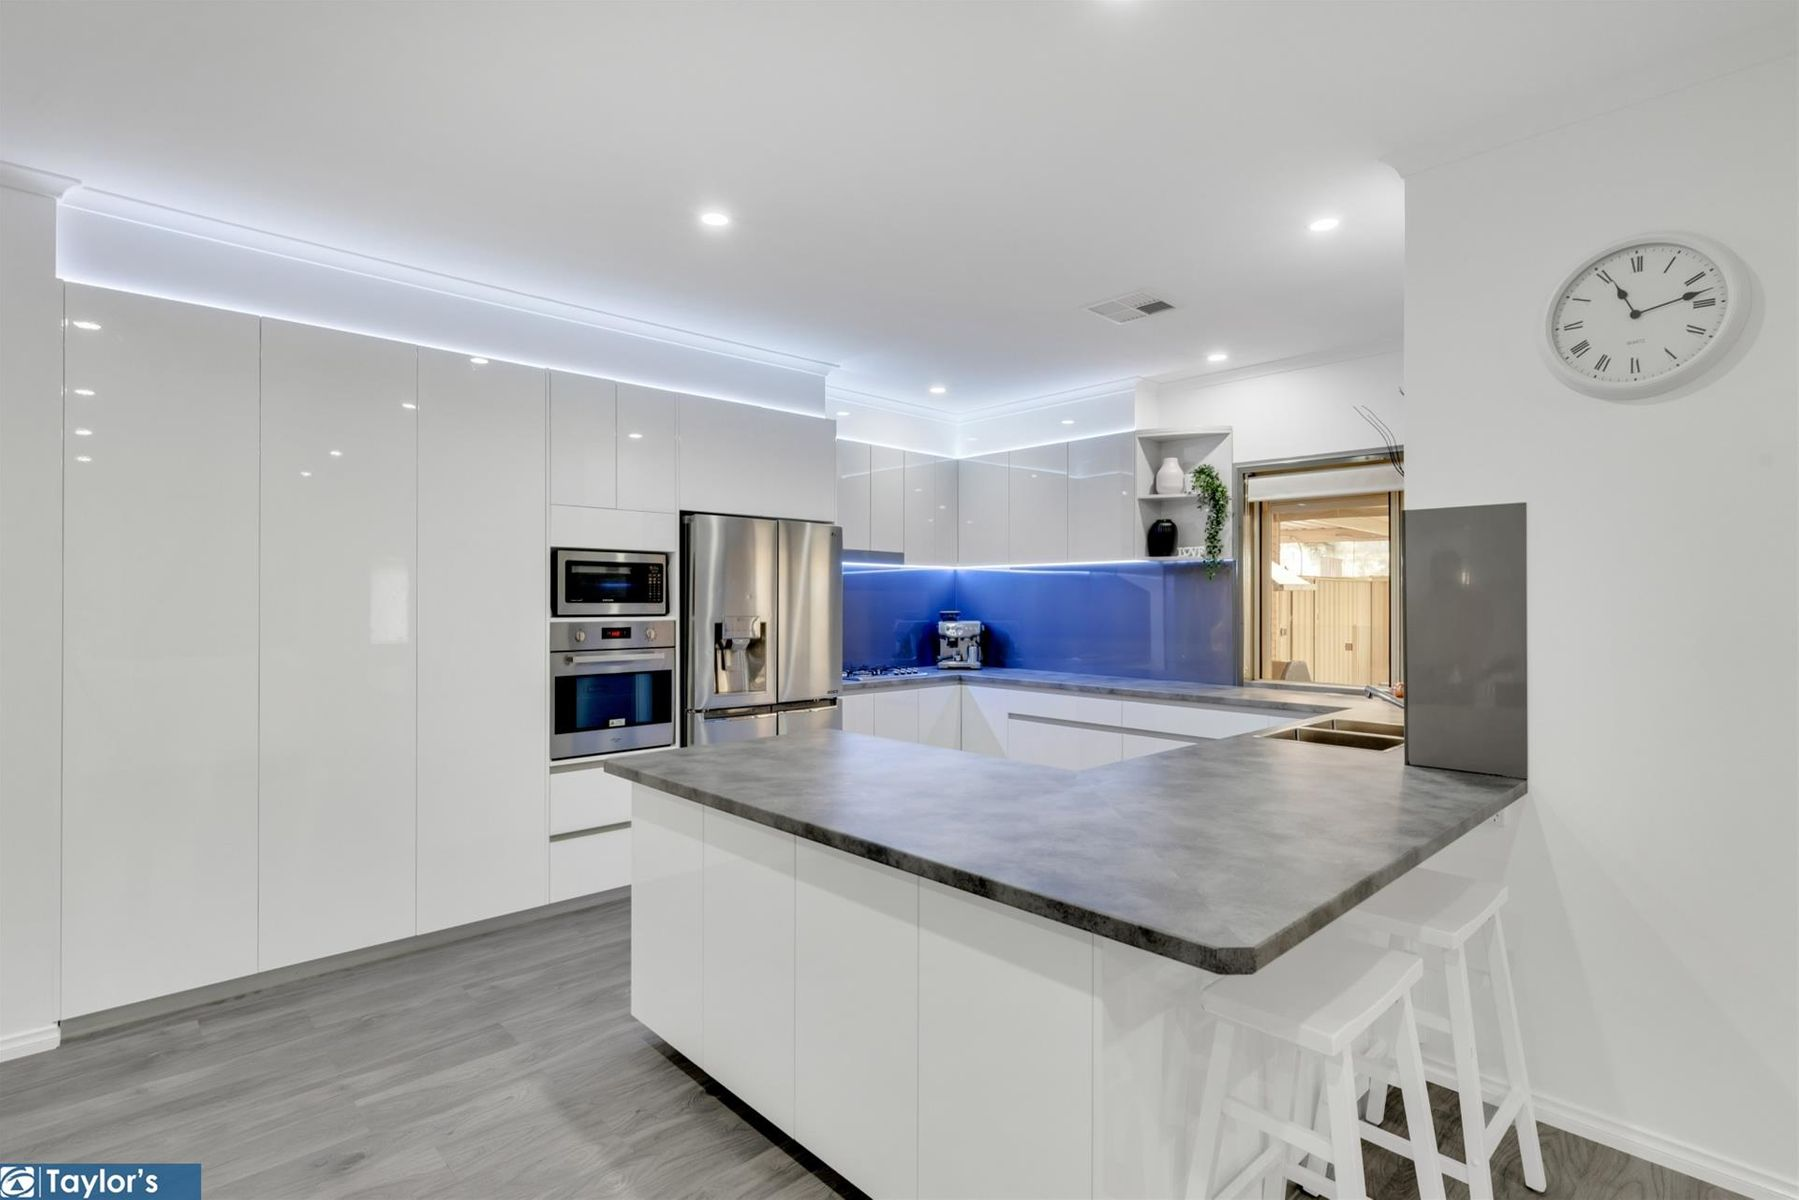 9 Koala Crescent, Paralowie, SA 5108